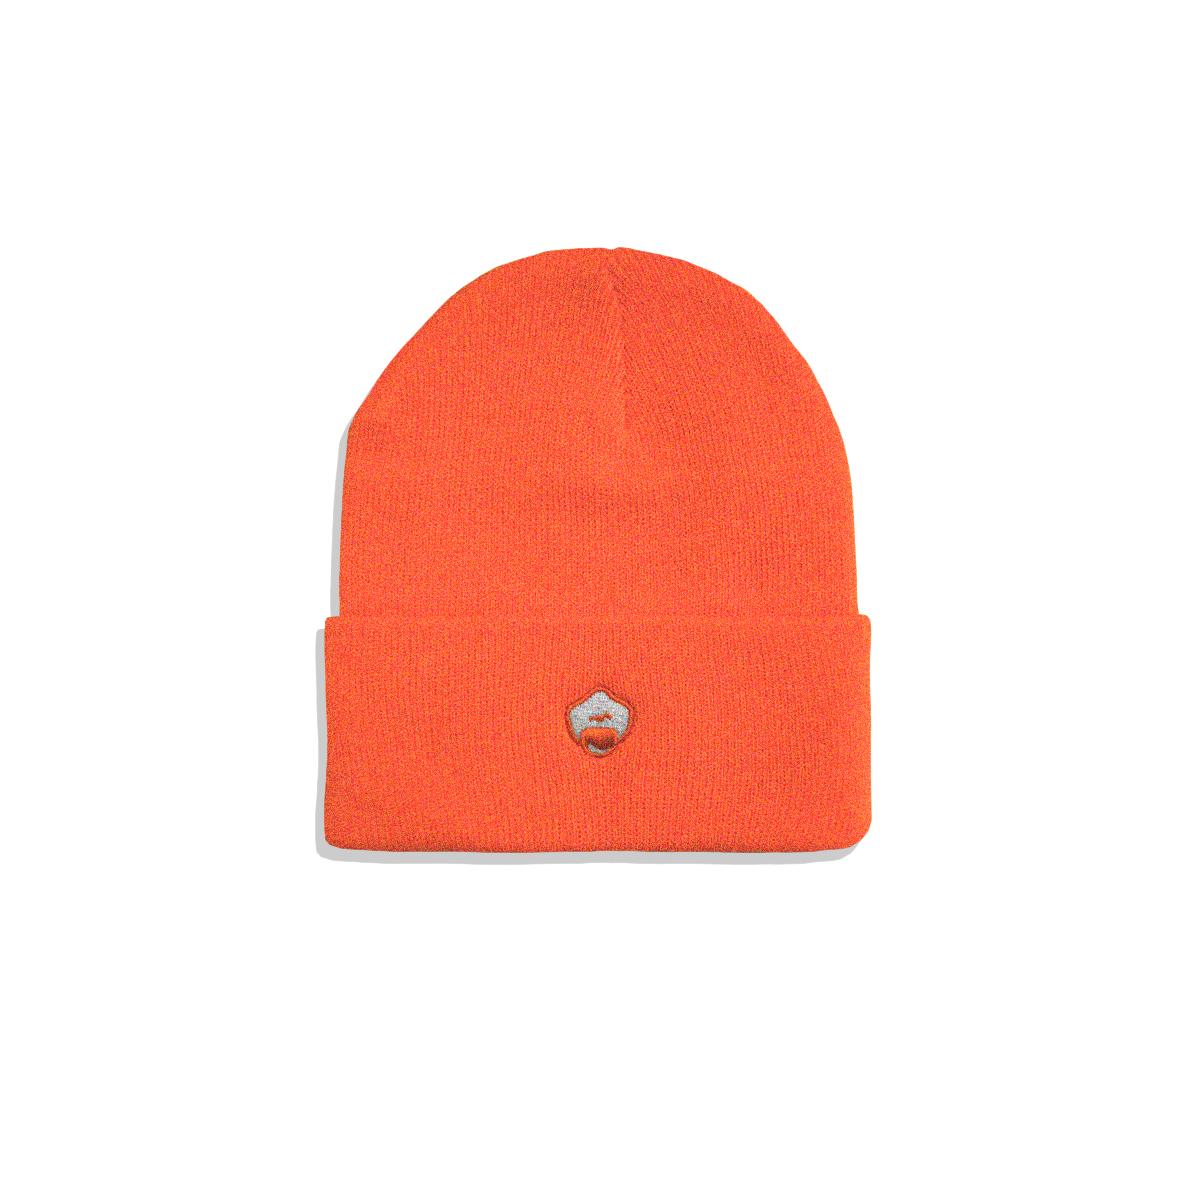 8b5beaba599 Workman Cuff Beanie Orange — MIGHTYKILLERS®